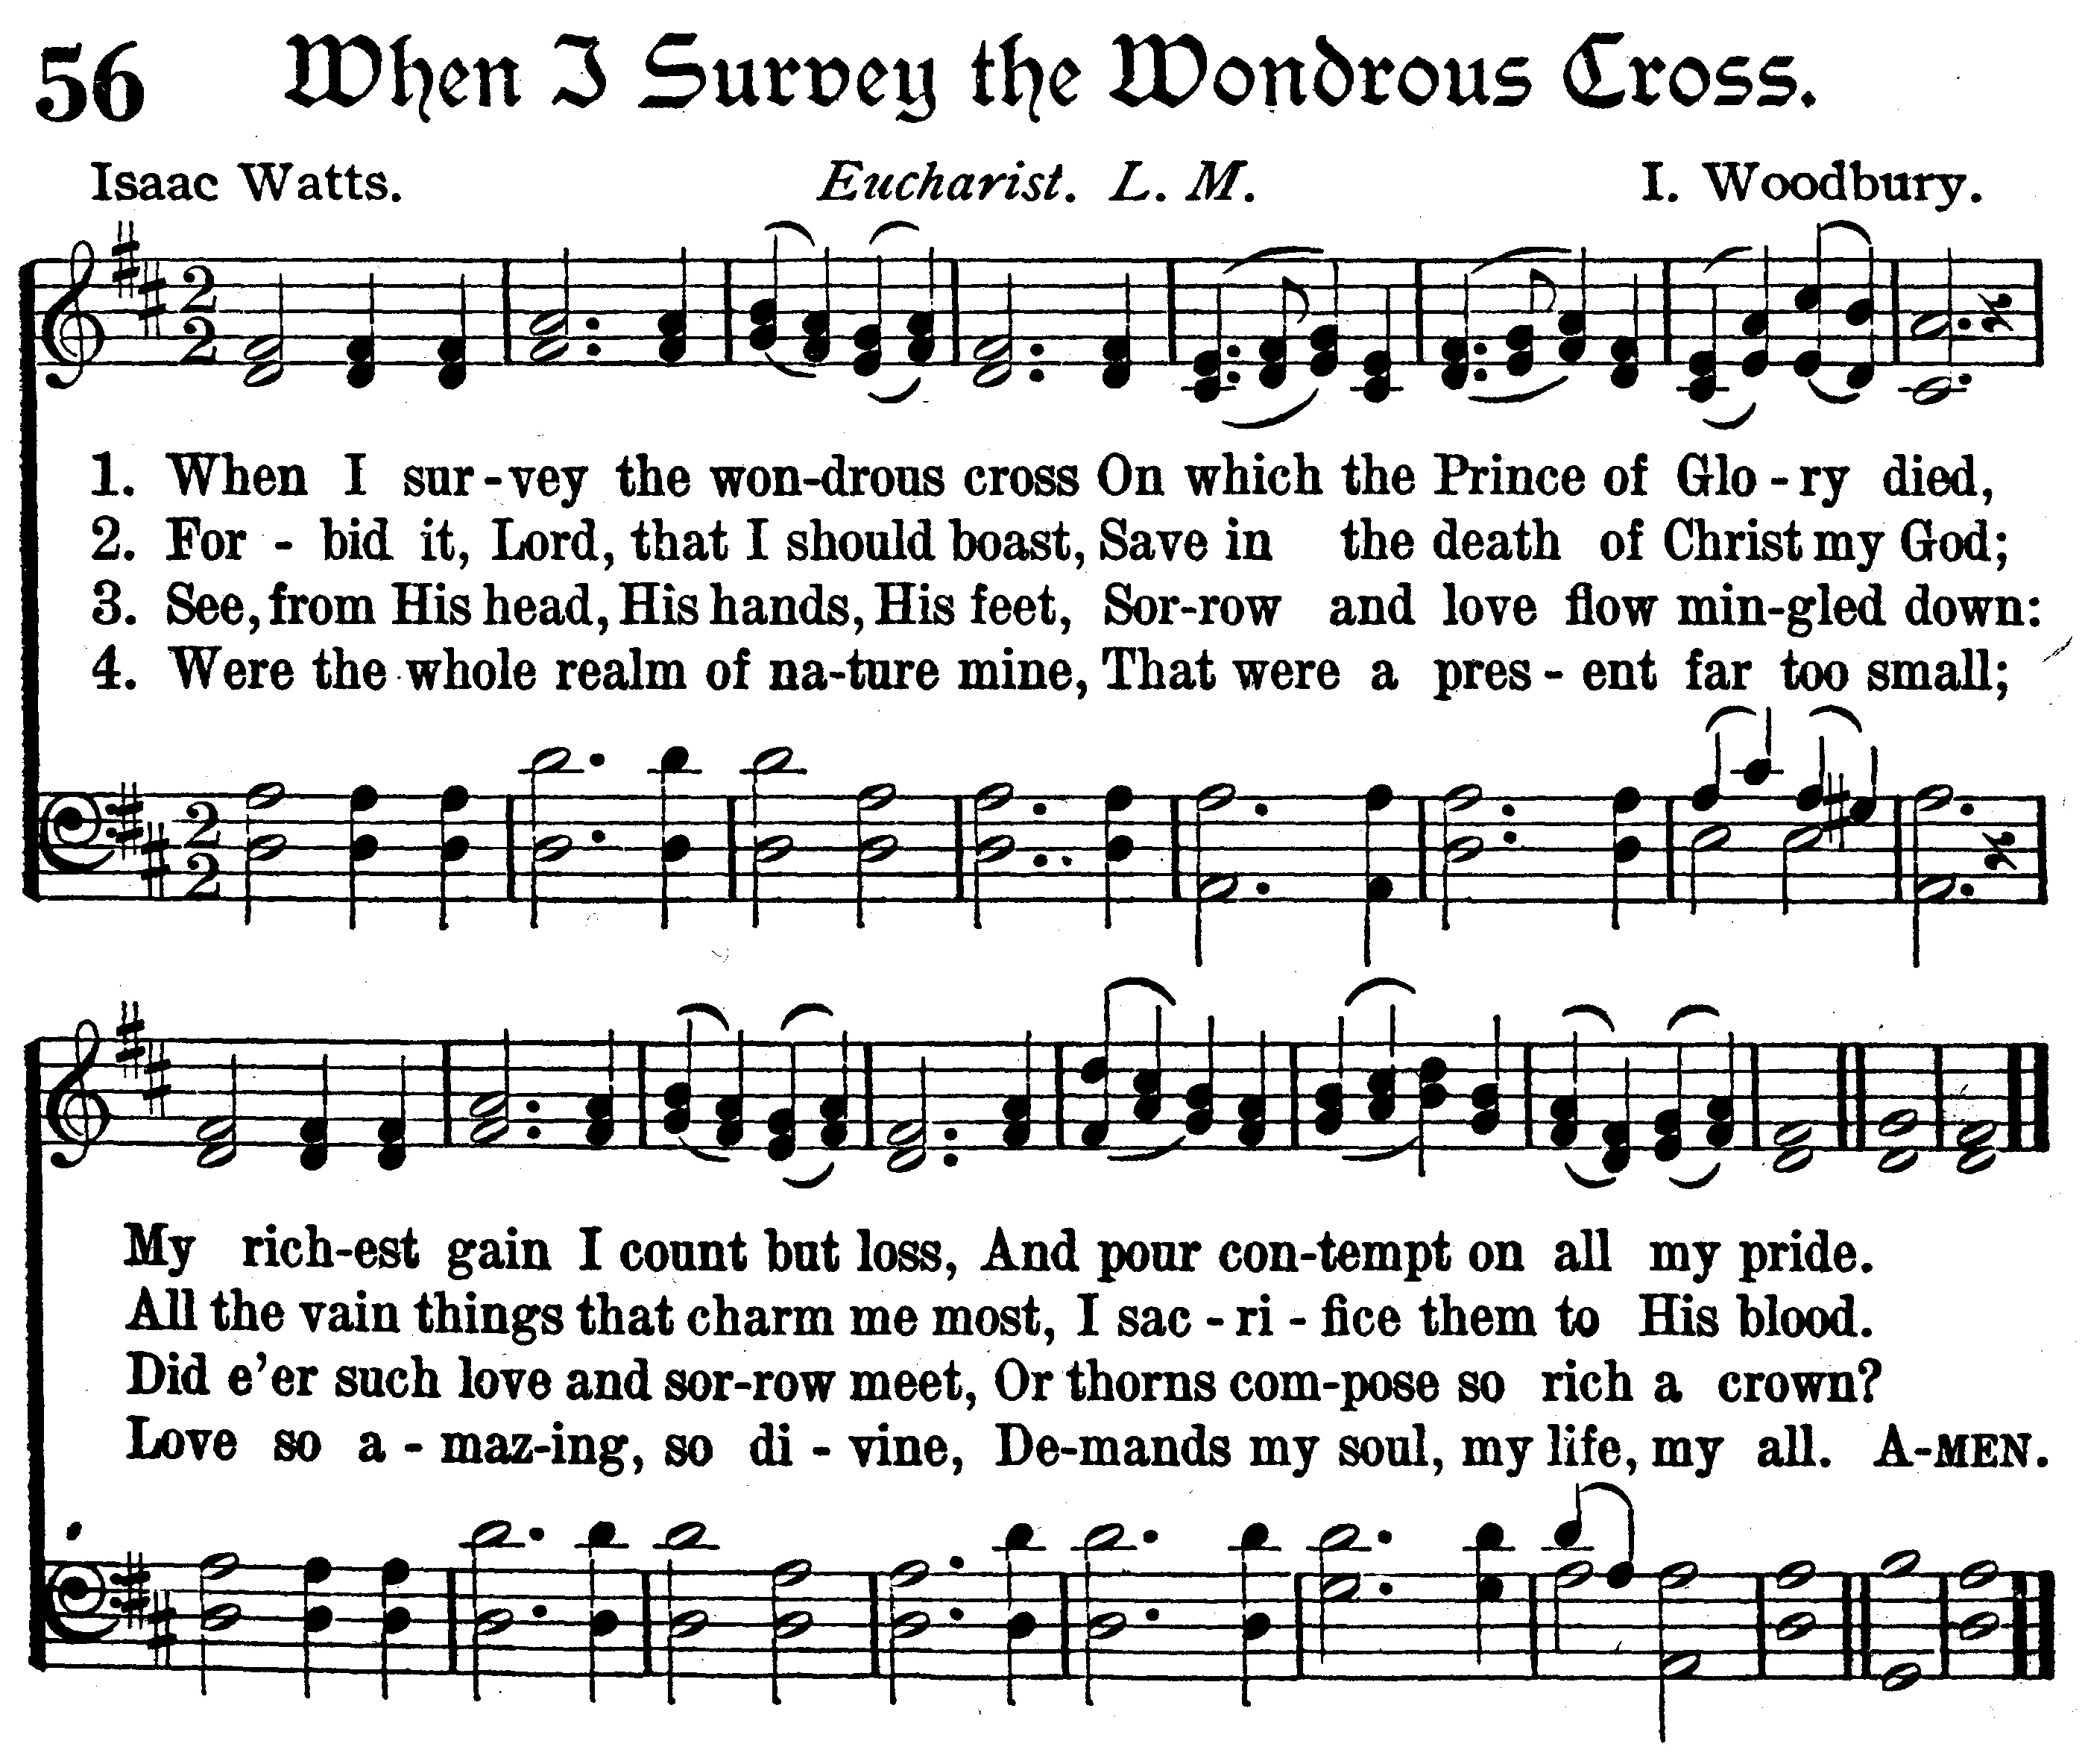 When I Survey The Wonderful Cross Lyrics